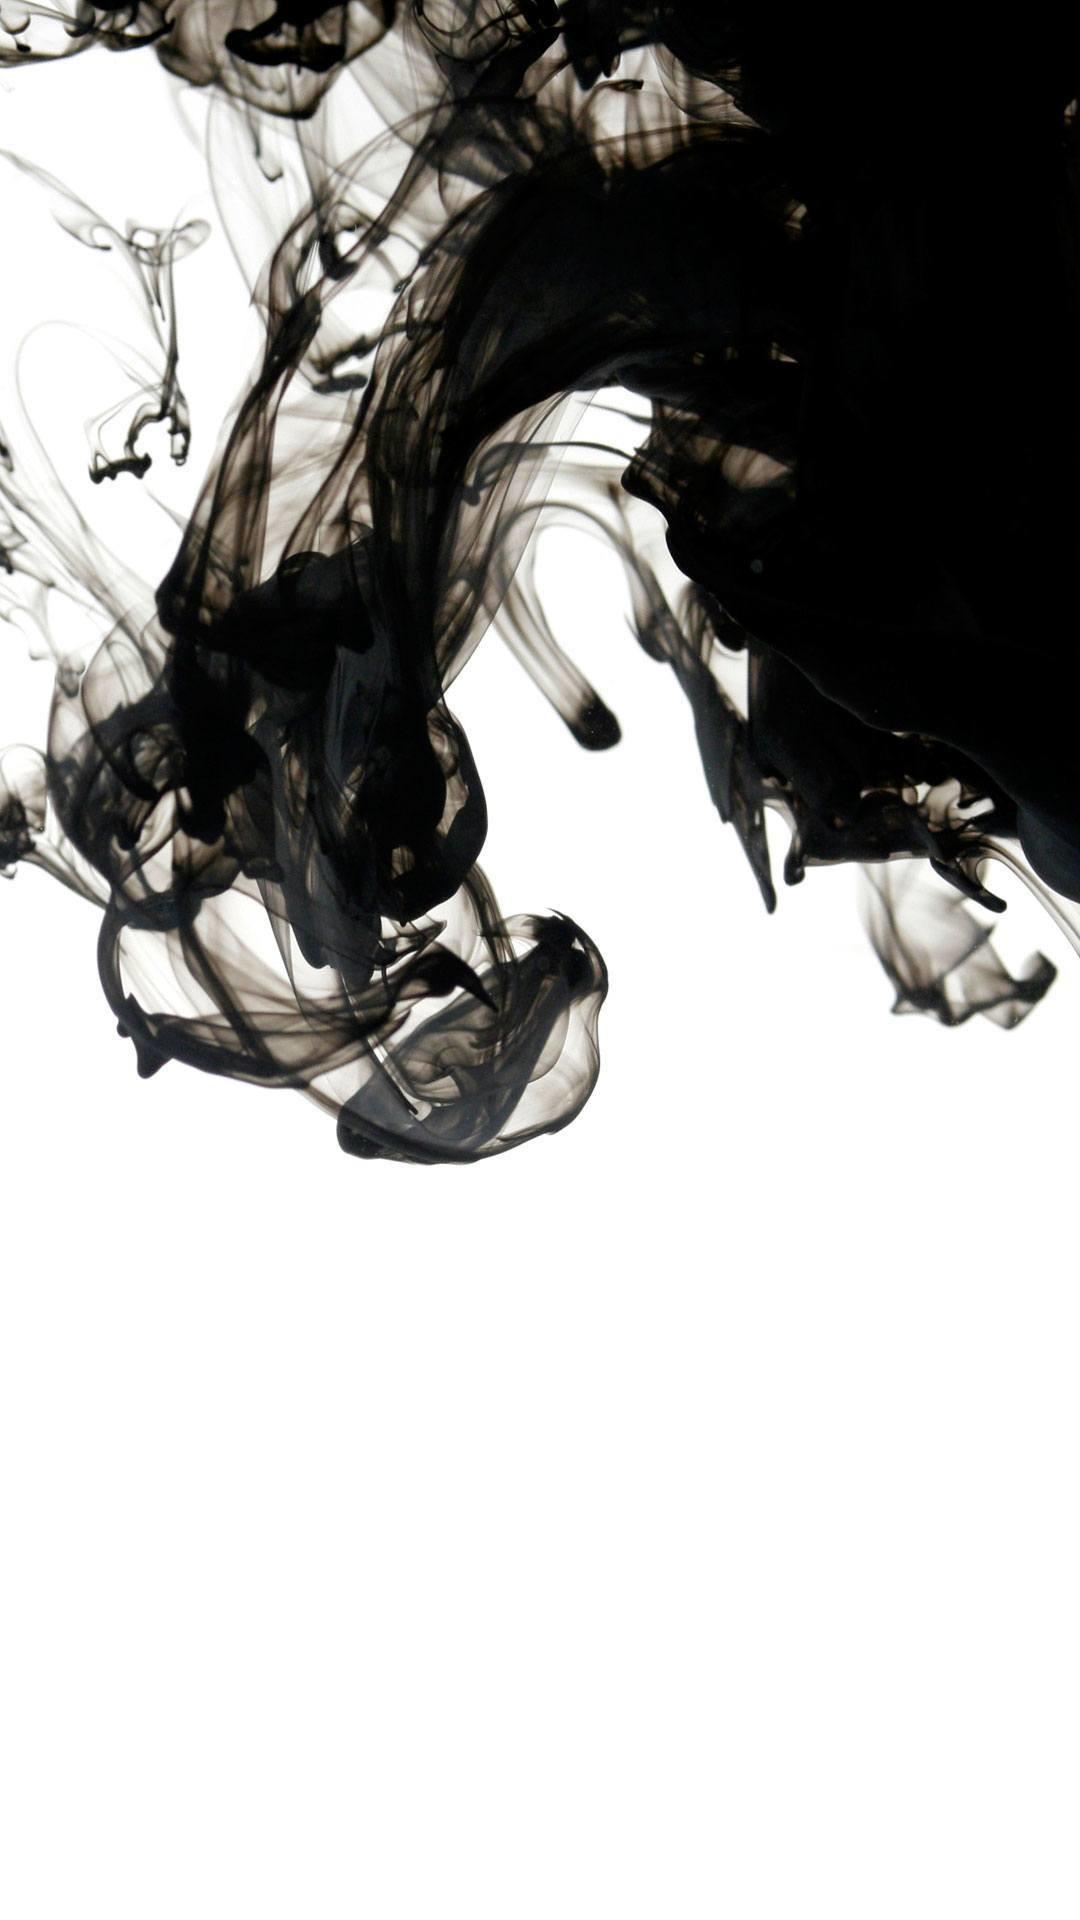 Black Ink In Water Wallpaper iPhone HD